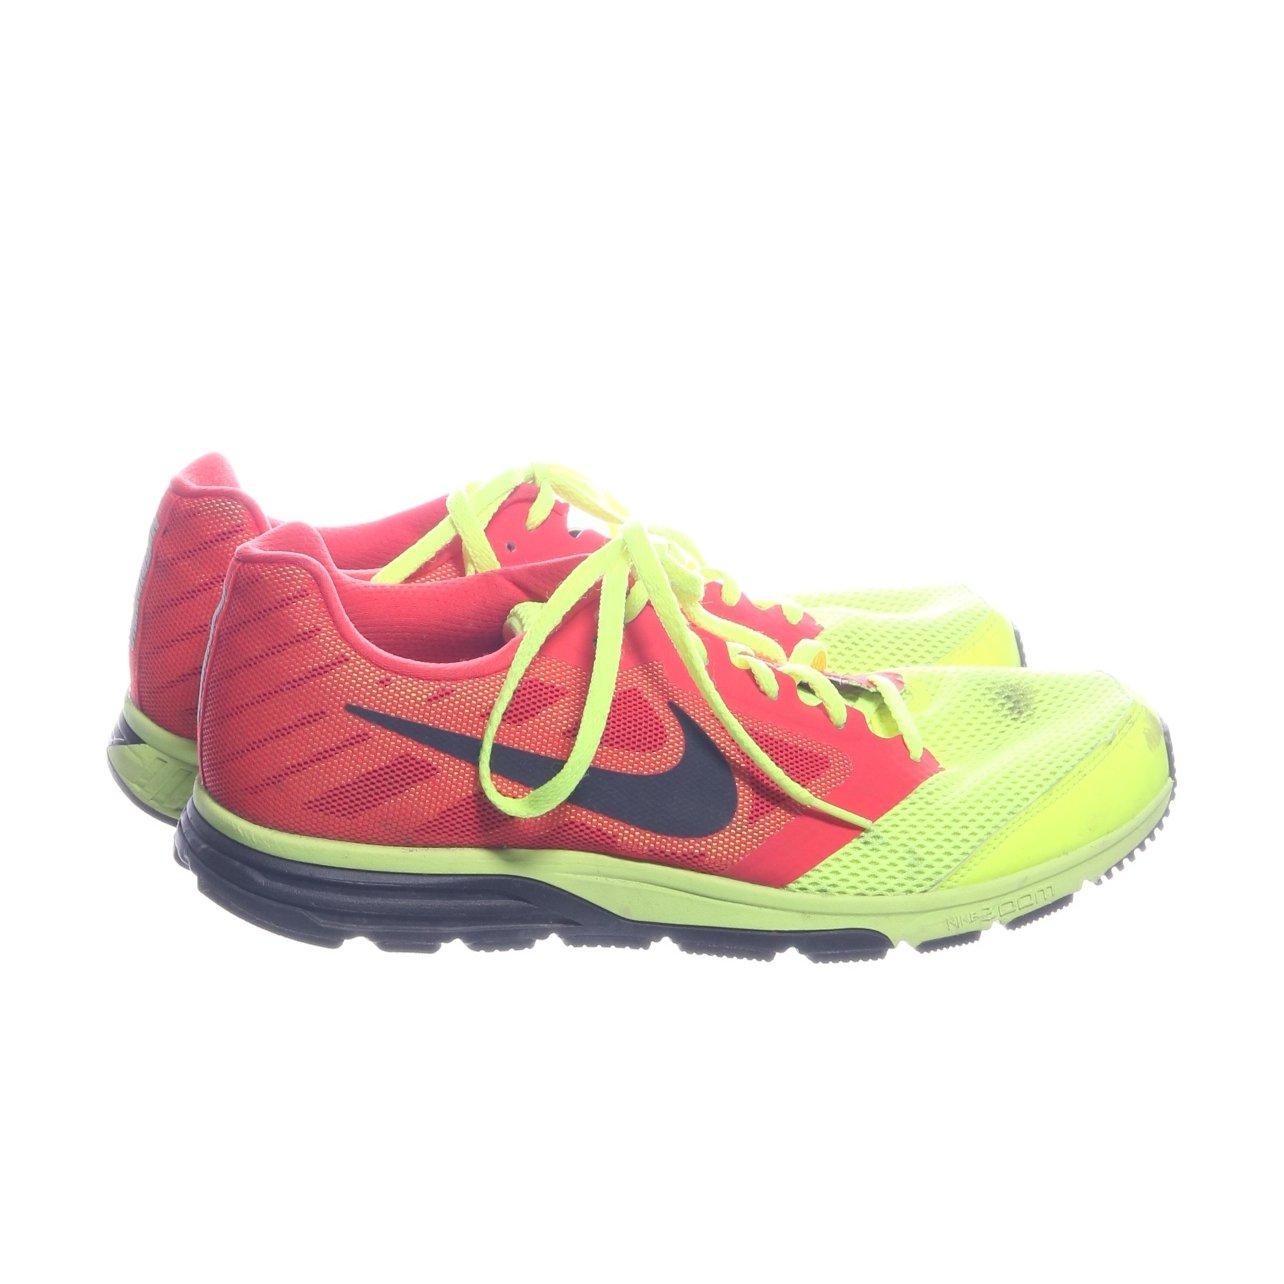 newest 0fd3f 0c103 Nike, Träningsskor, Strl  44, Zoom Fly, Gul Korallfärgad Orange